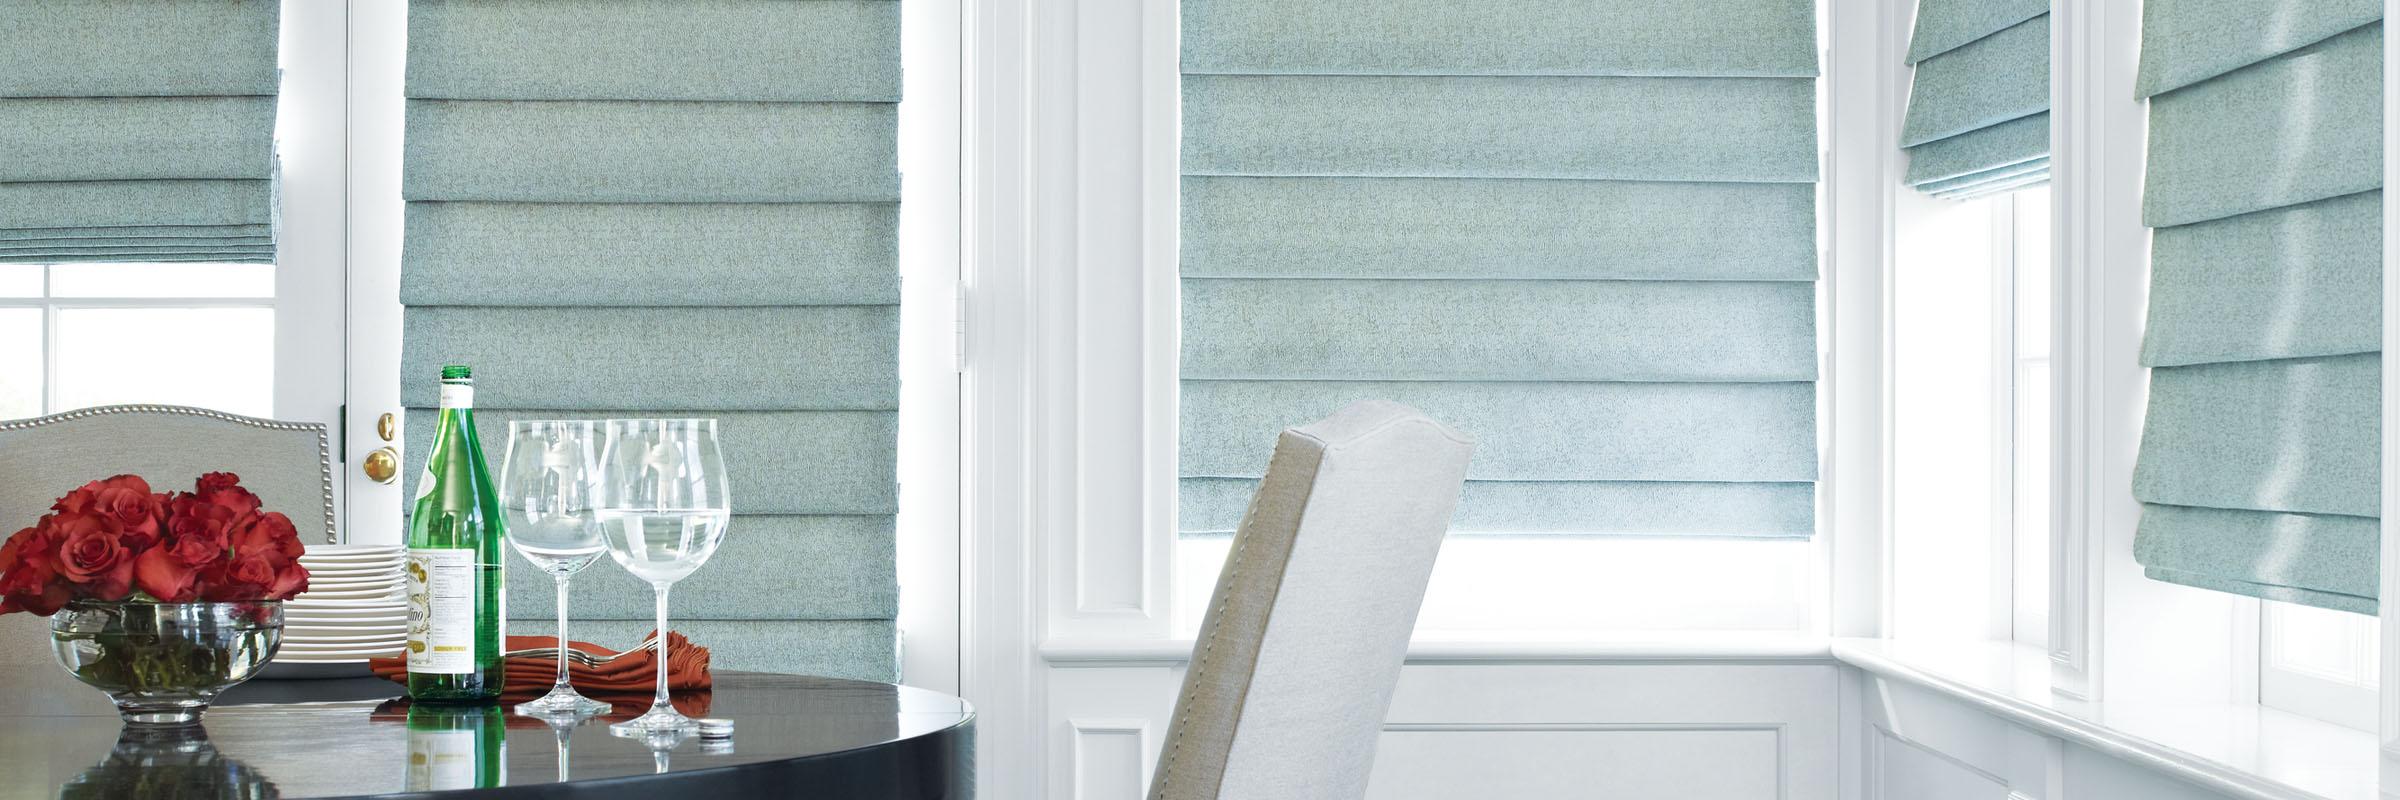 fabric shades fabric roman shades in dreamweaver fountain - design studio ... PTECGBP